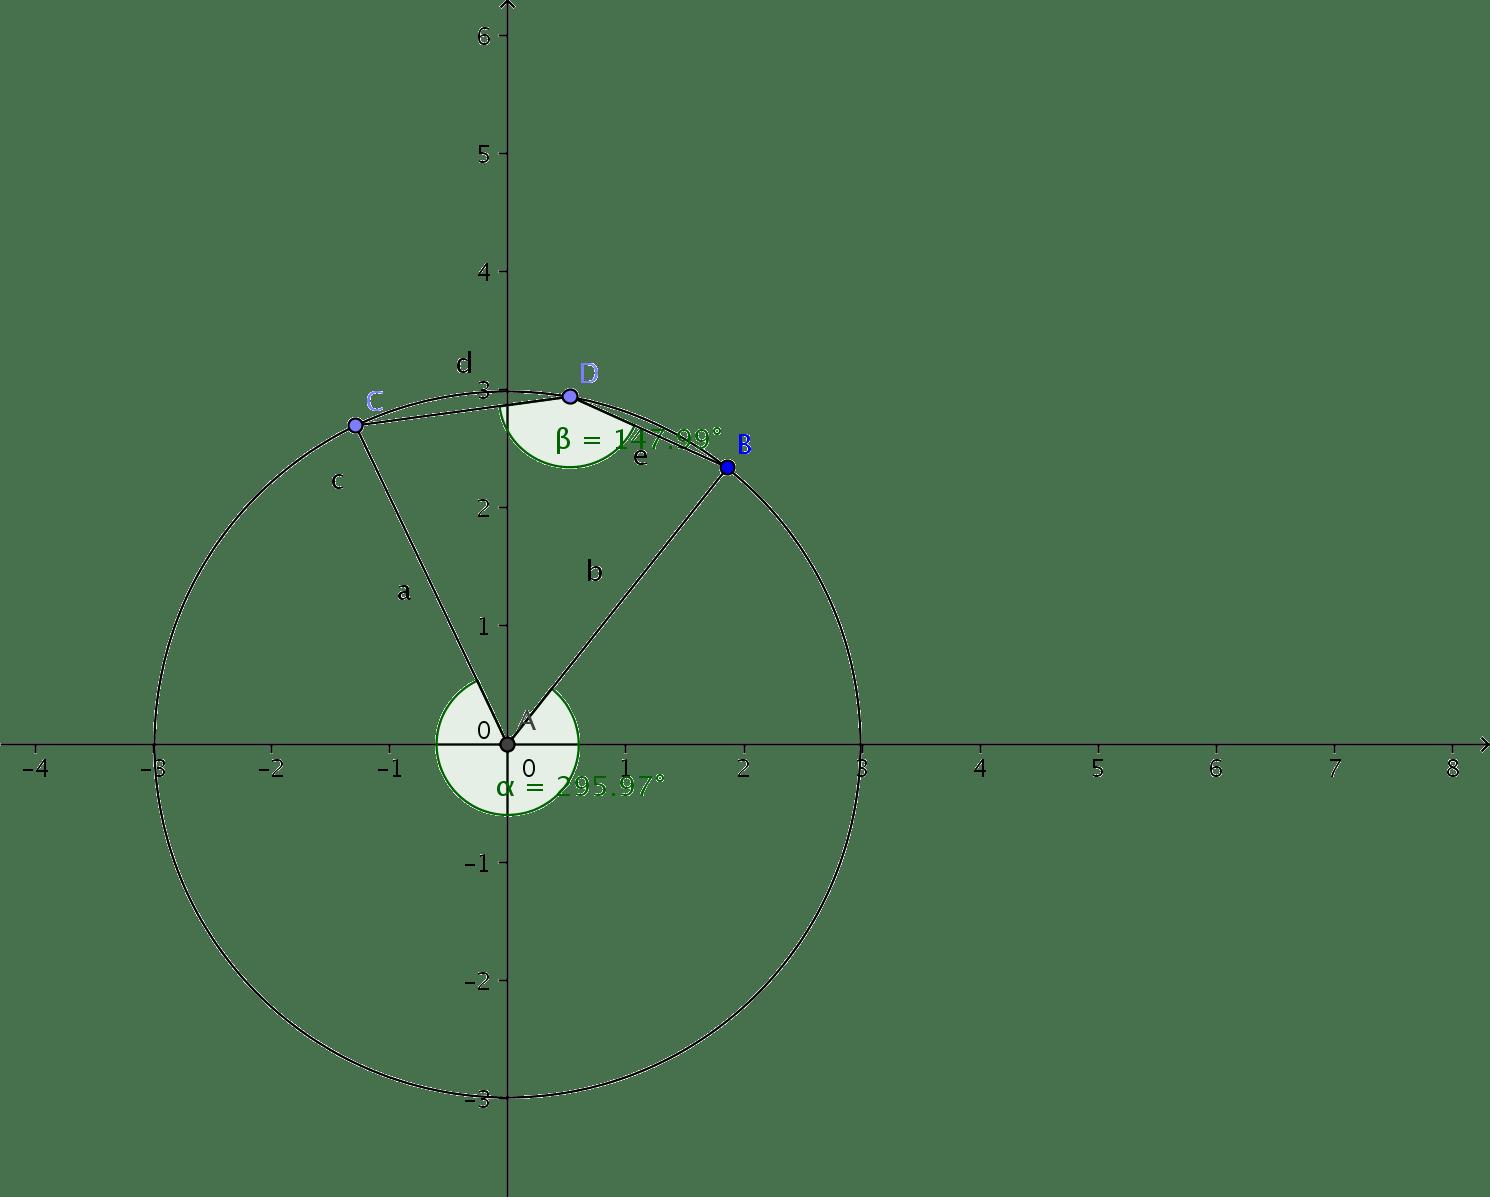 Angulo central concavo, ángulo inscrito casi llano